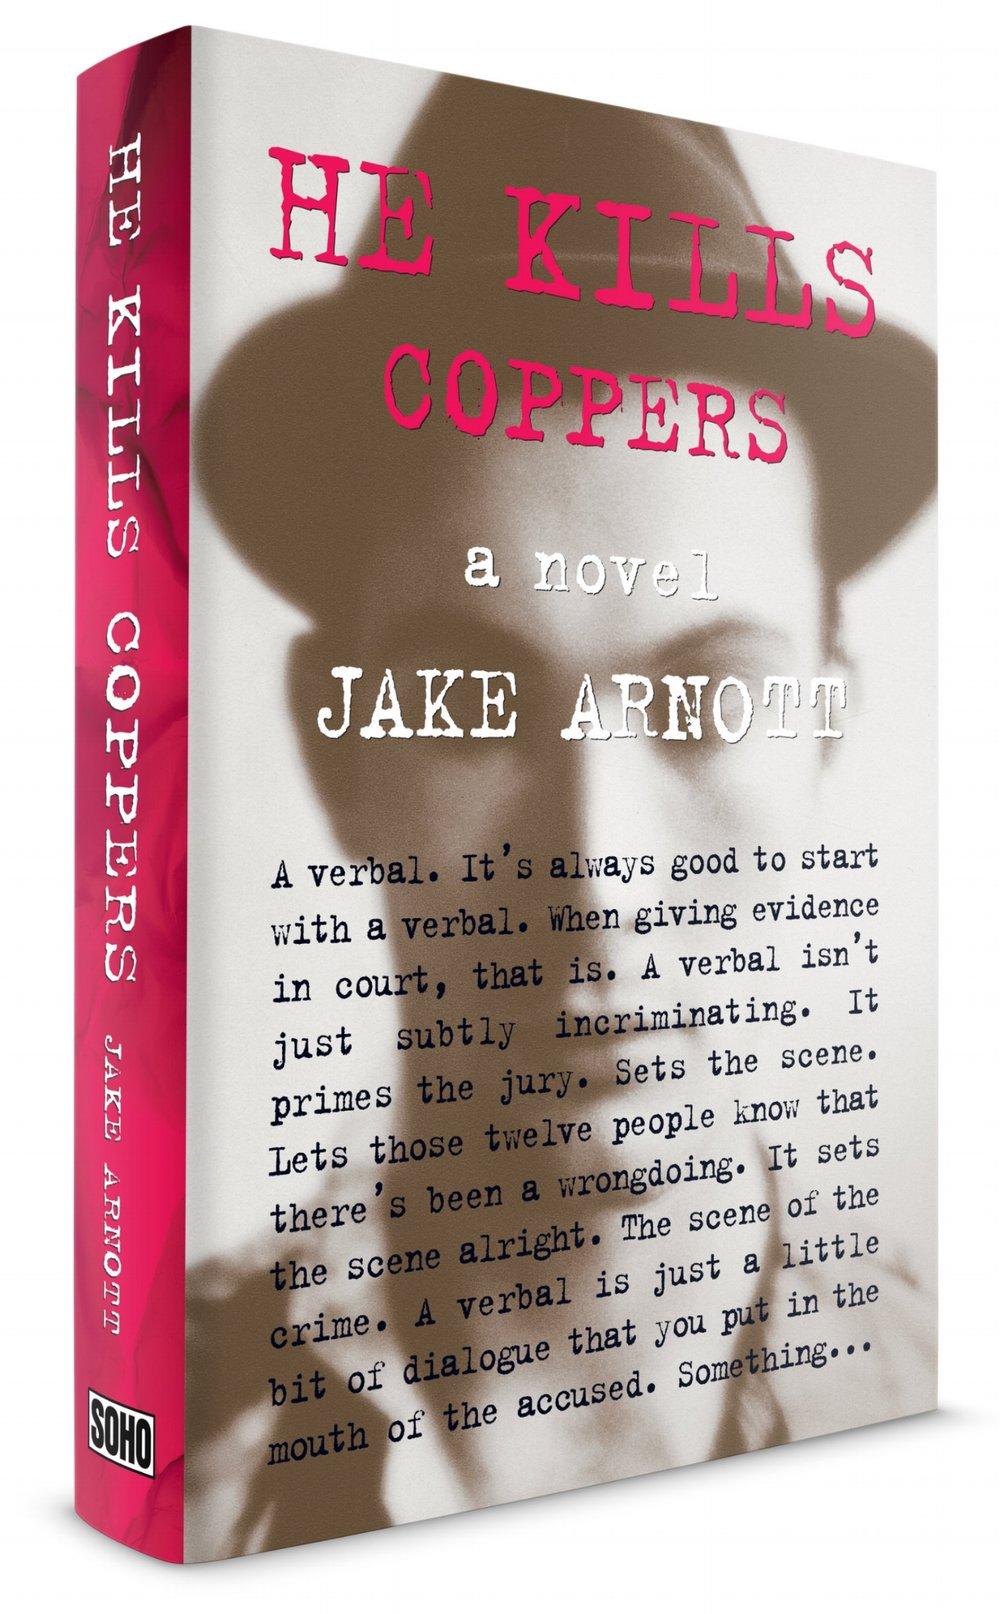 Coppers Jacket.jpg